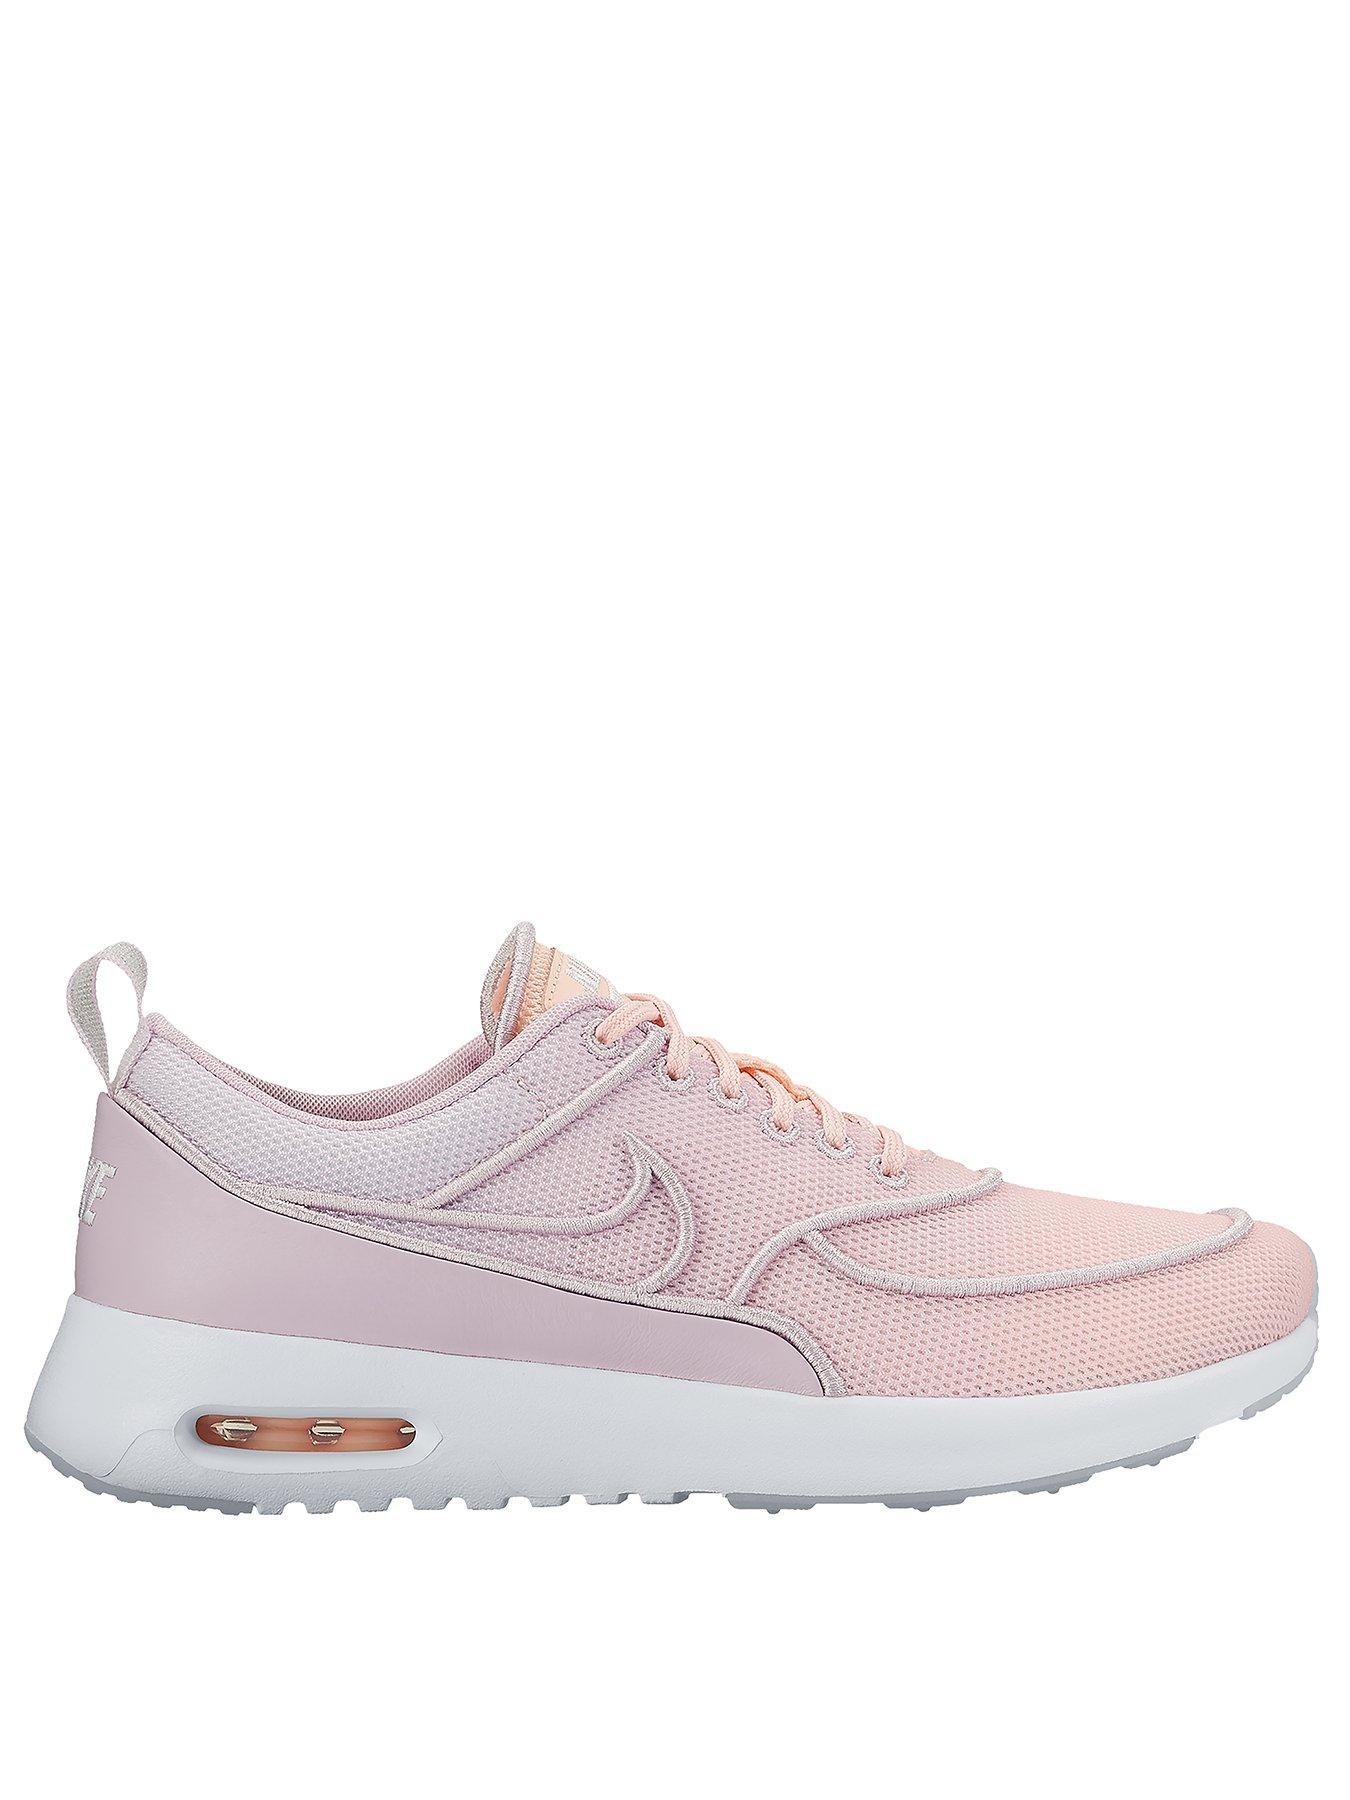 Pink Glaze Drapes The Nike Air Max Thea Premium